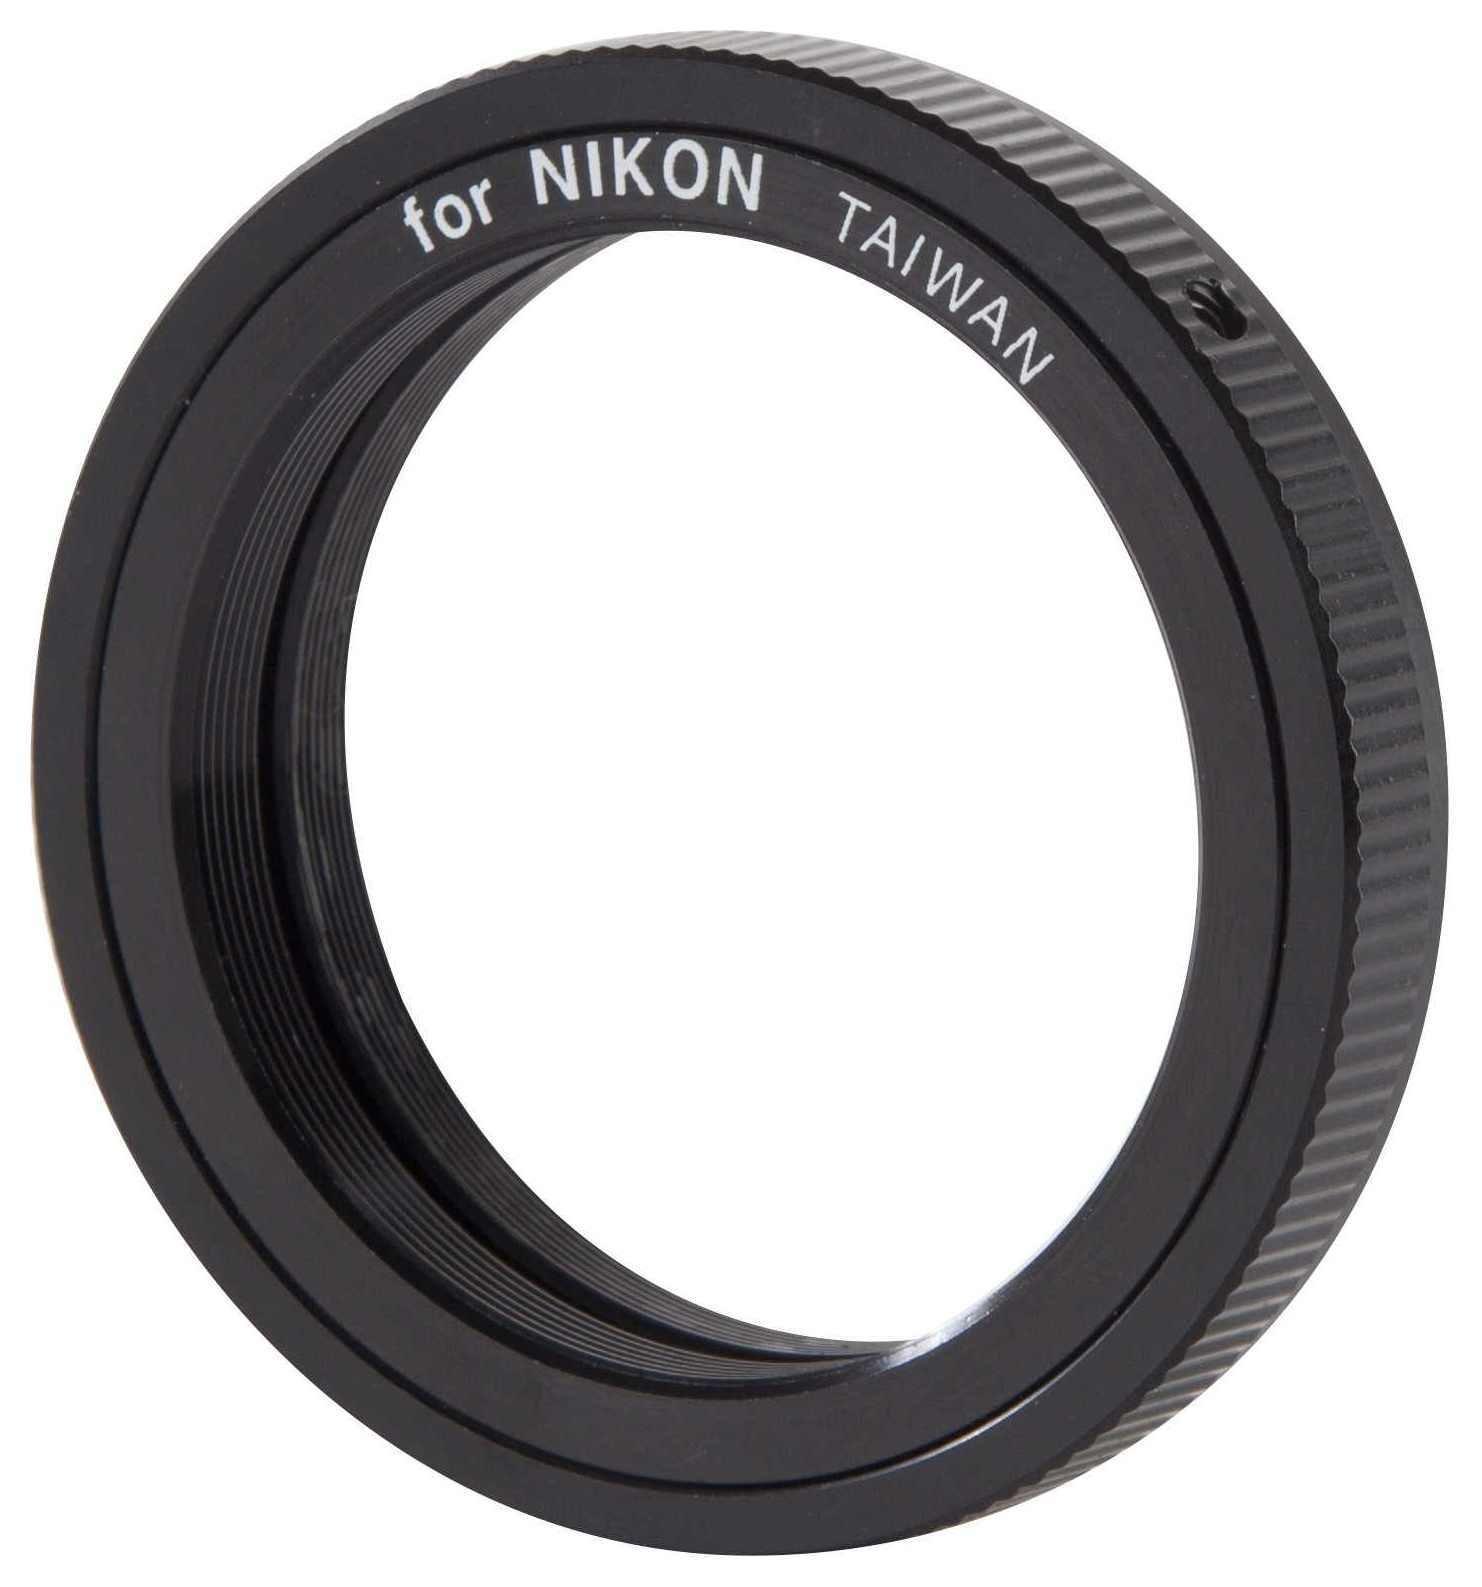 Celestron Nikon SLR T Adaptor